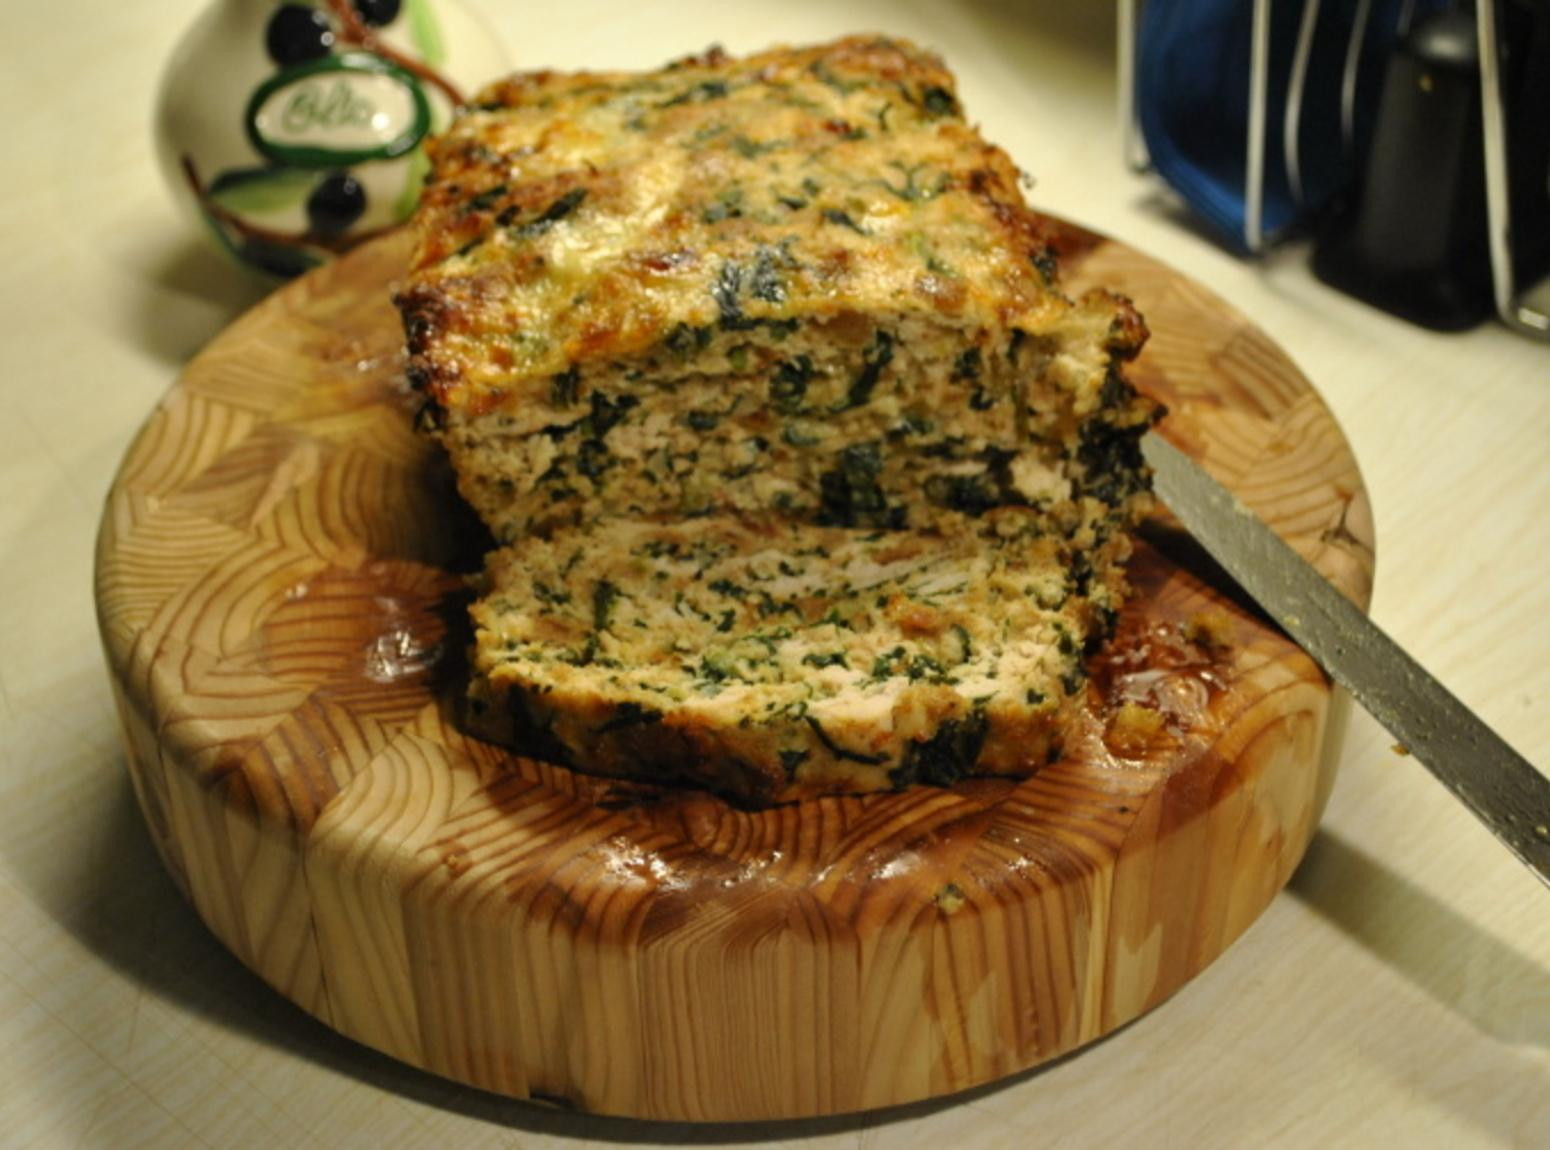 Turkey Meatloaf Recipe Healthy  Healthy Turkey Meatloaf Recipe